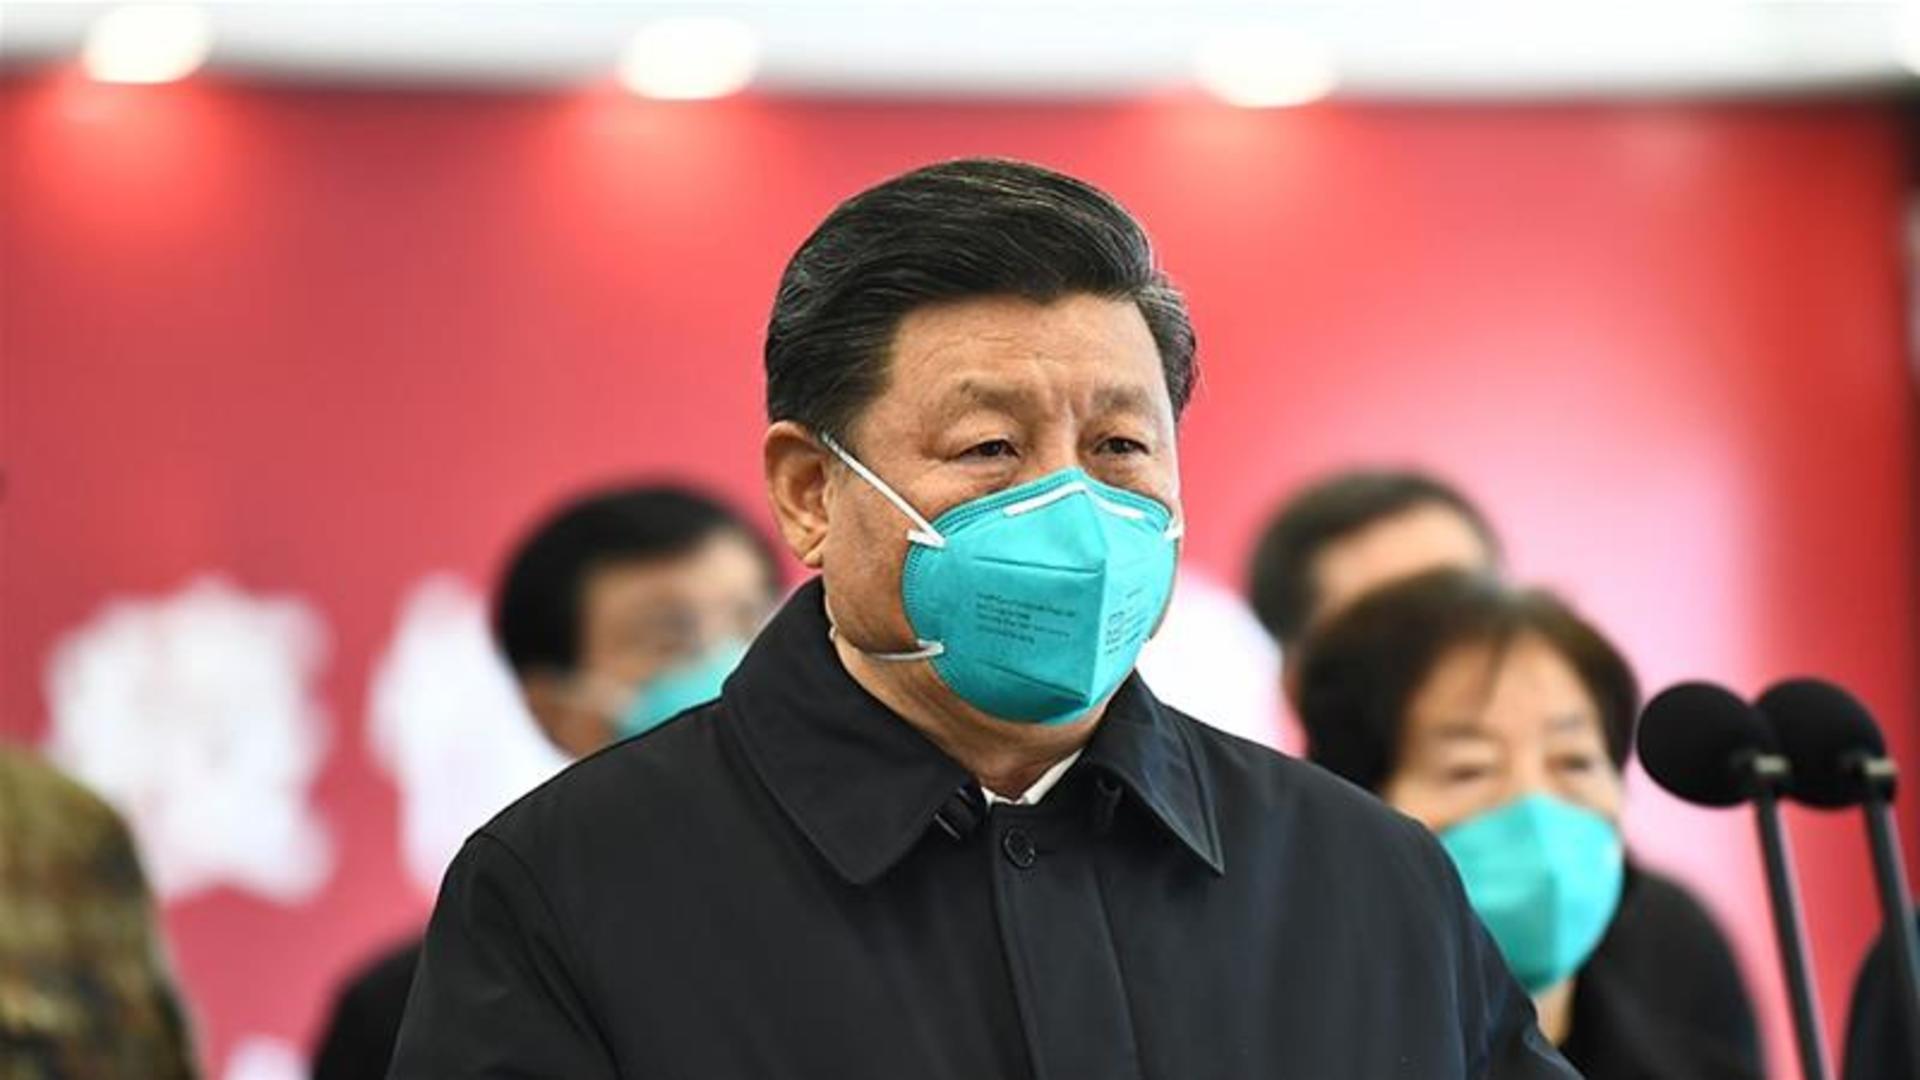 President Xi visits Wuhan as coronavirus outbreak slows in China